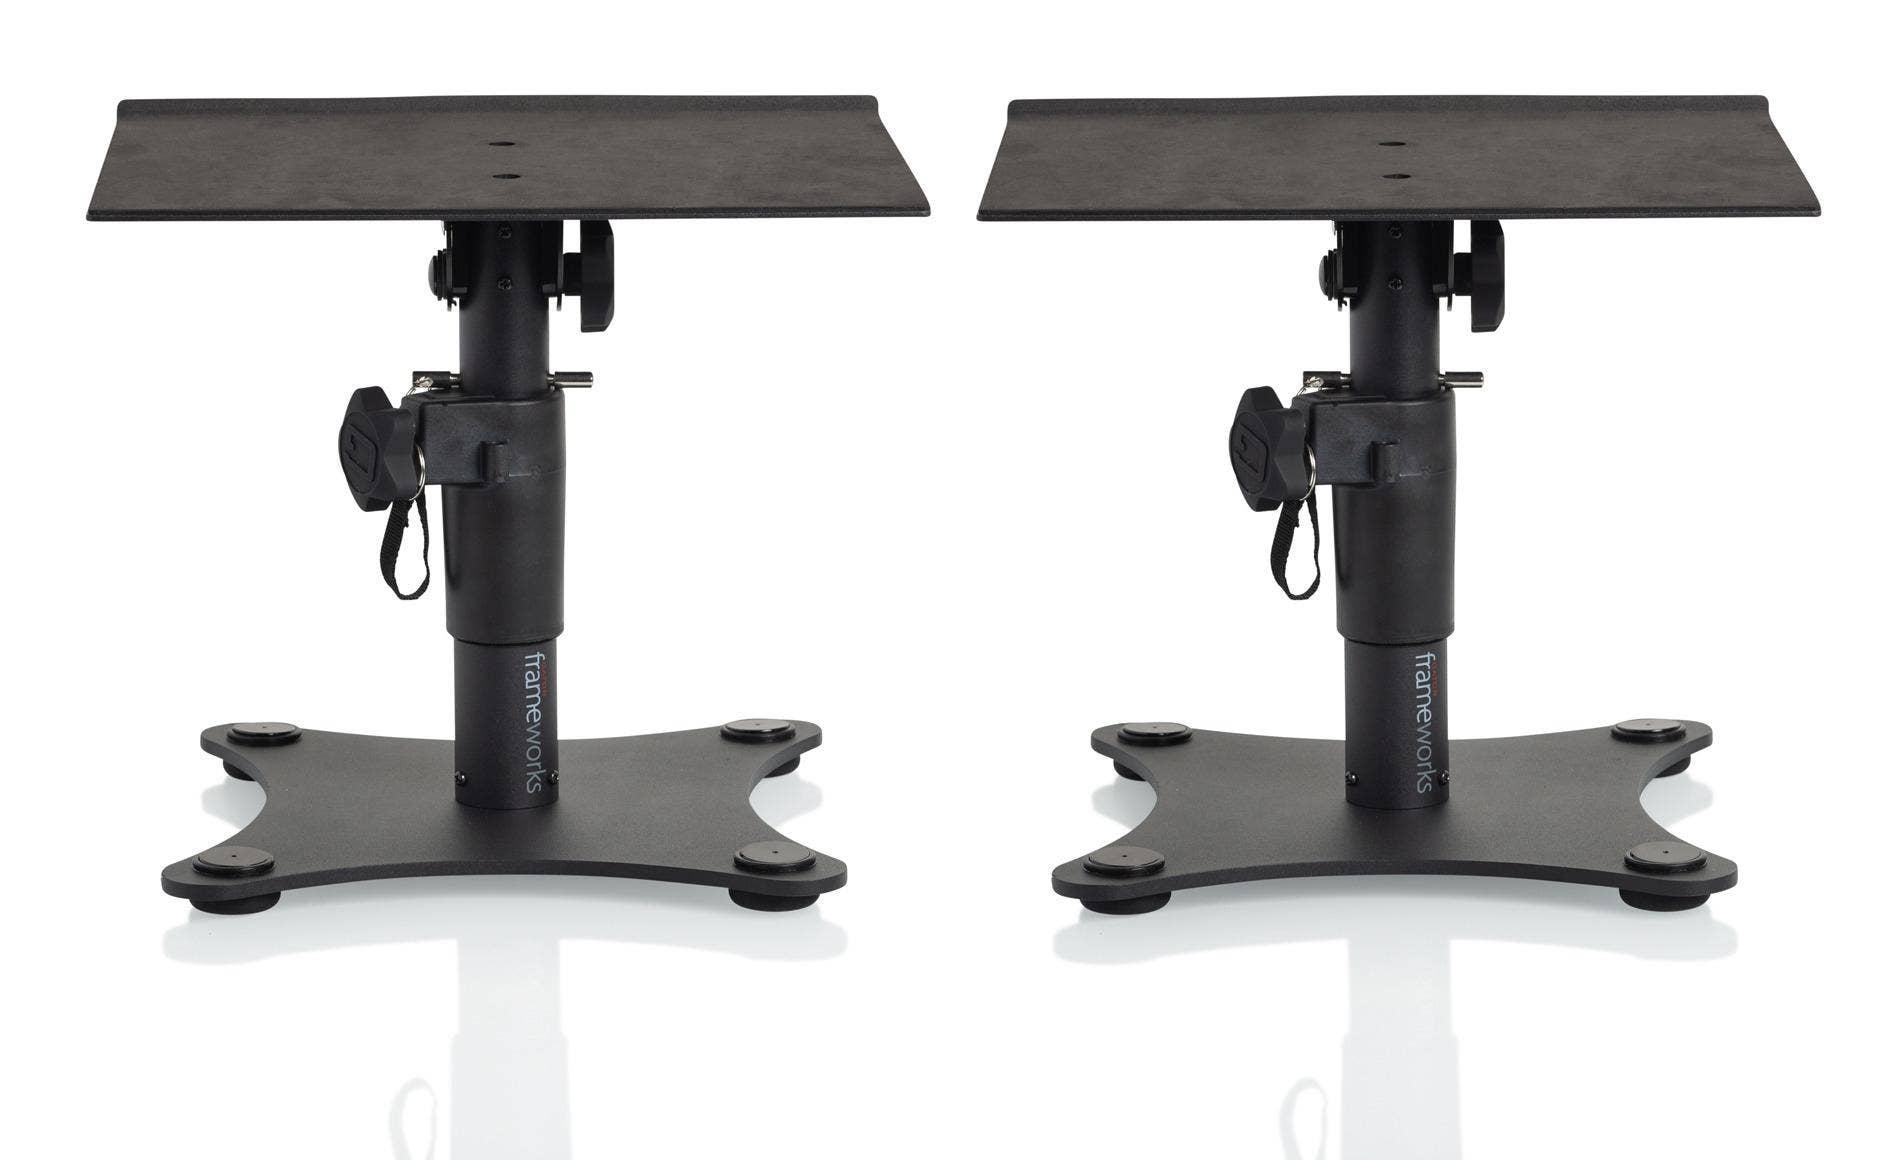 Gator Frameworks Adjustable Height Desktop Studio Monitor Stand